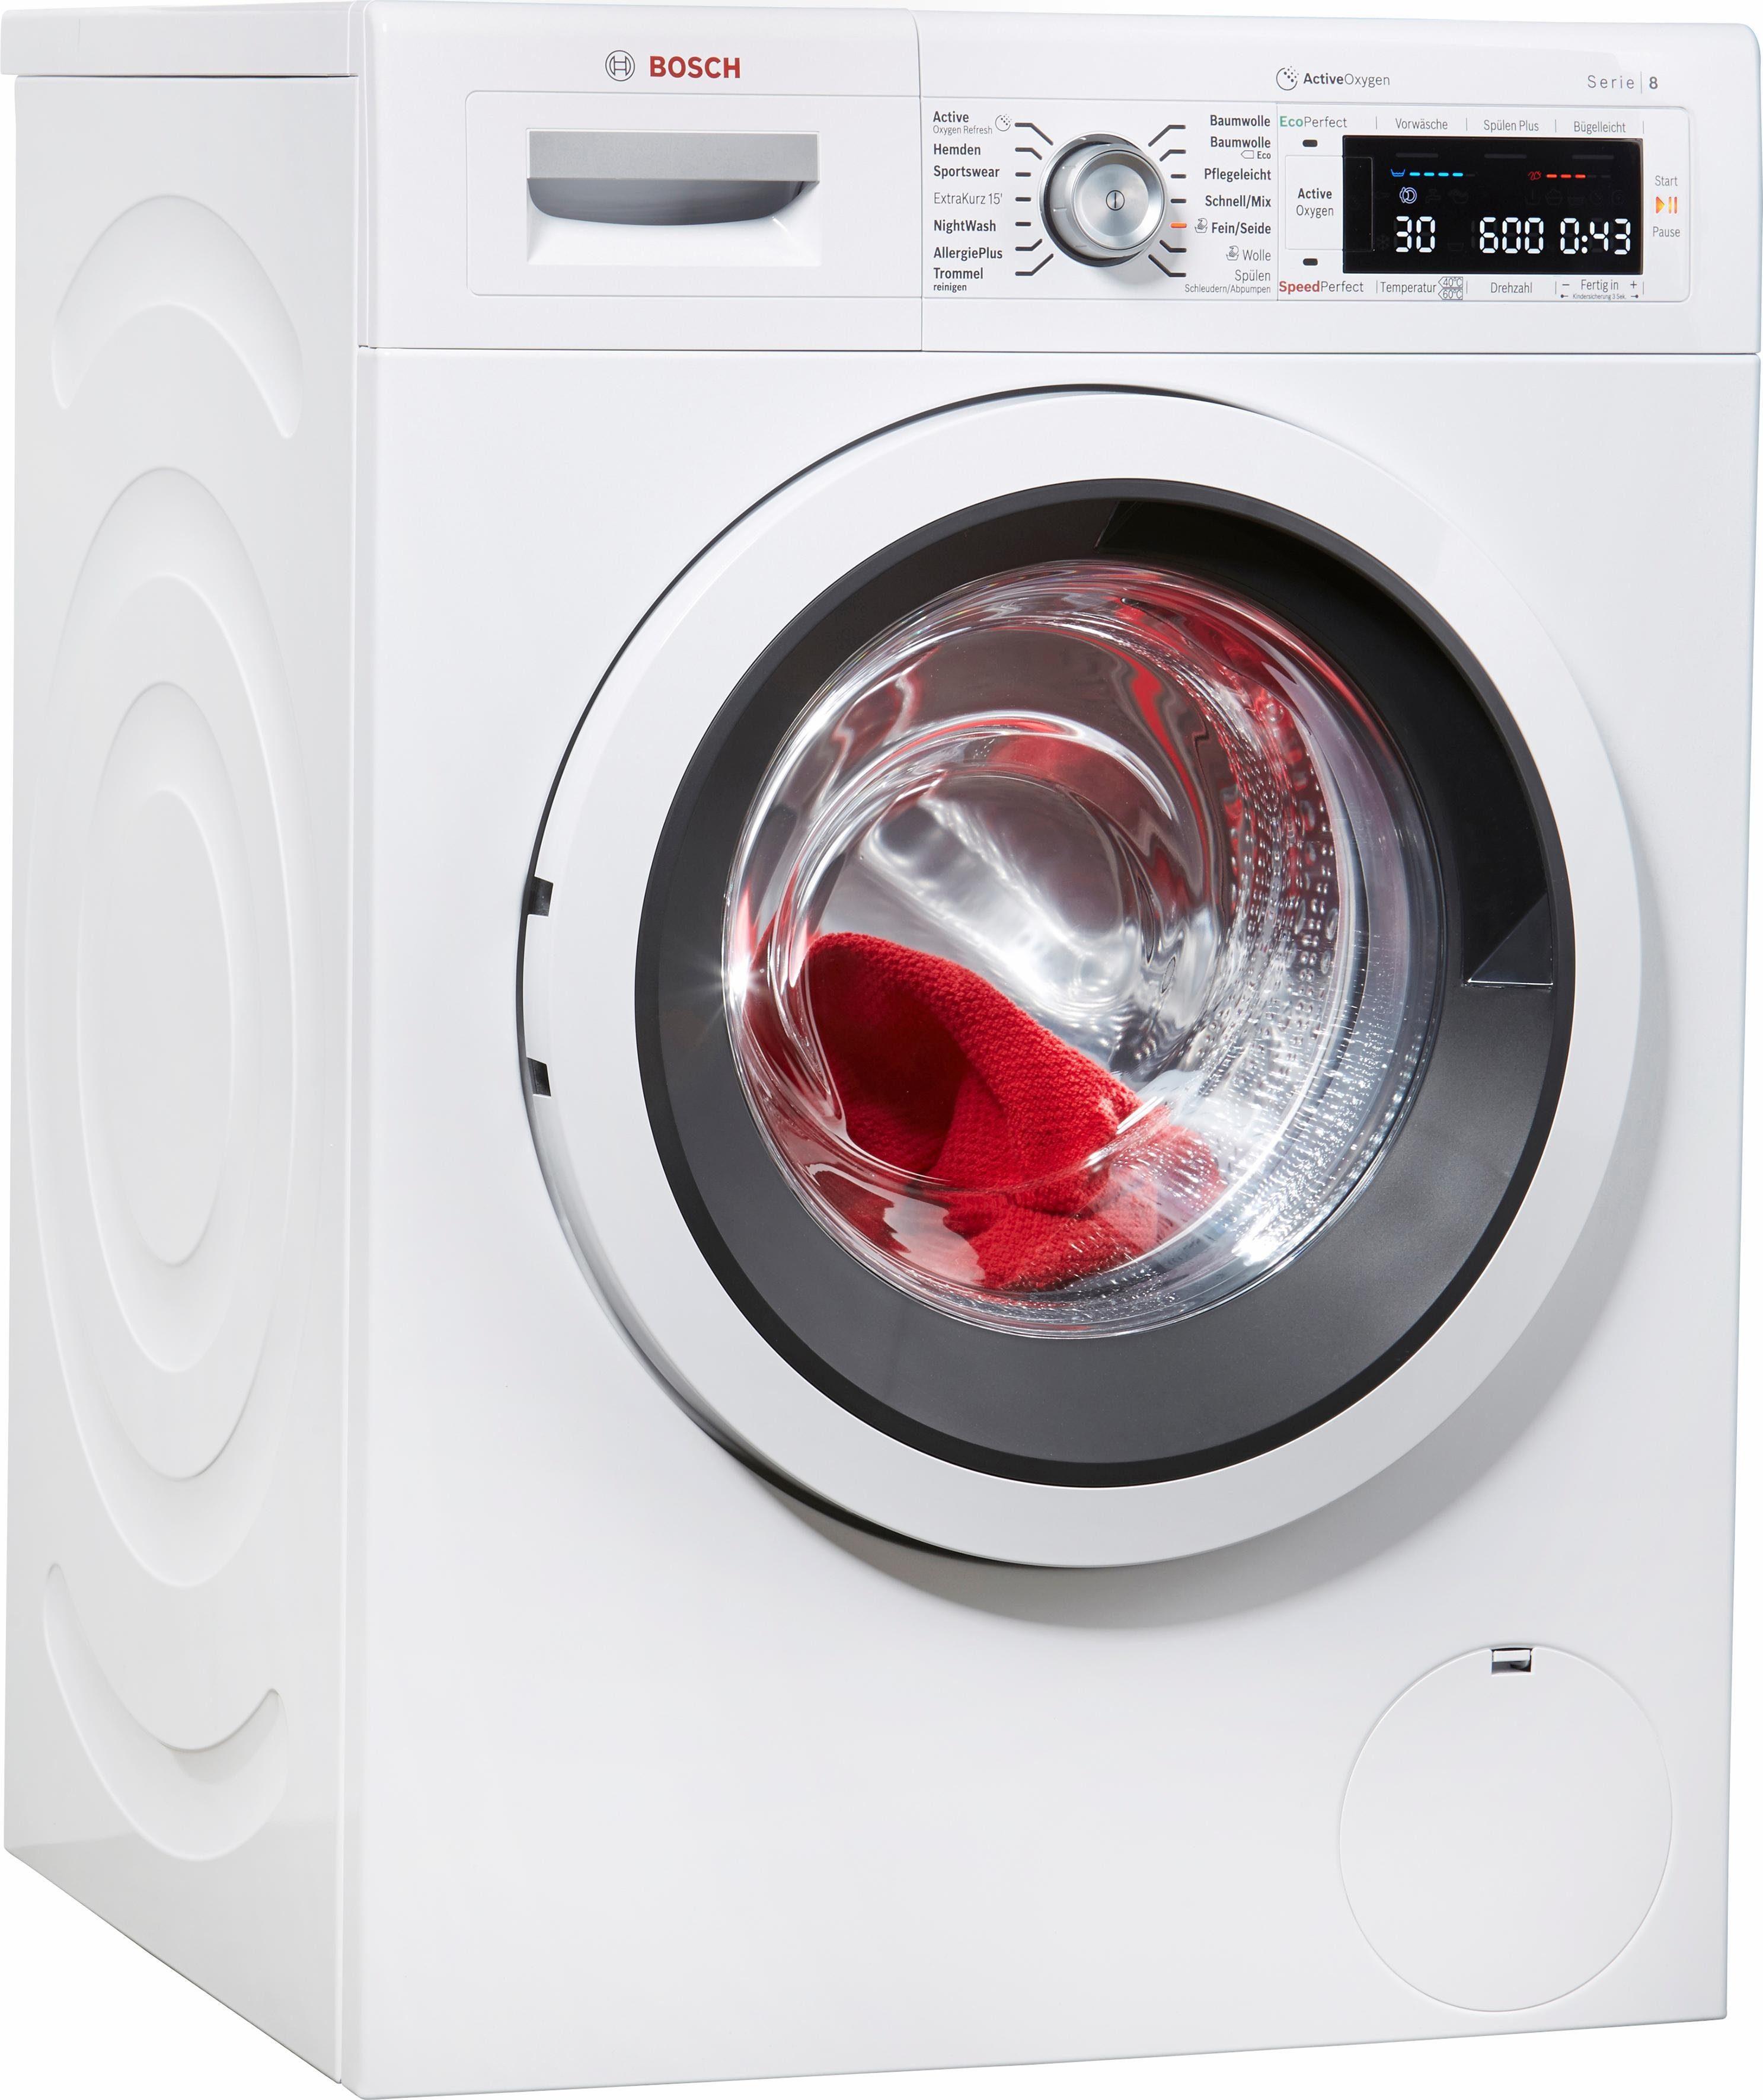 BOSCH Waschmaschine 8 WAW287V0, 9 kg, 1400 U/Min